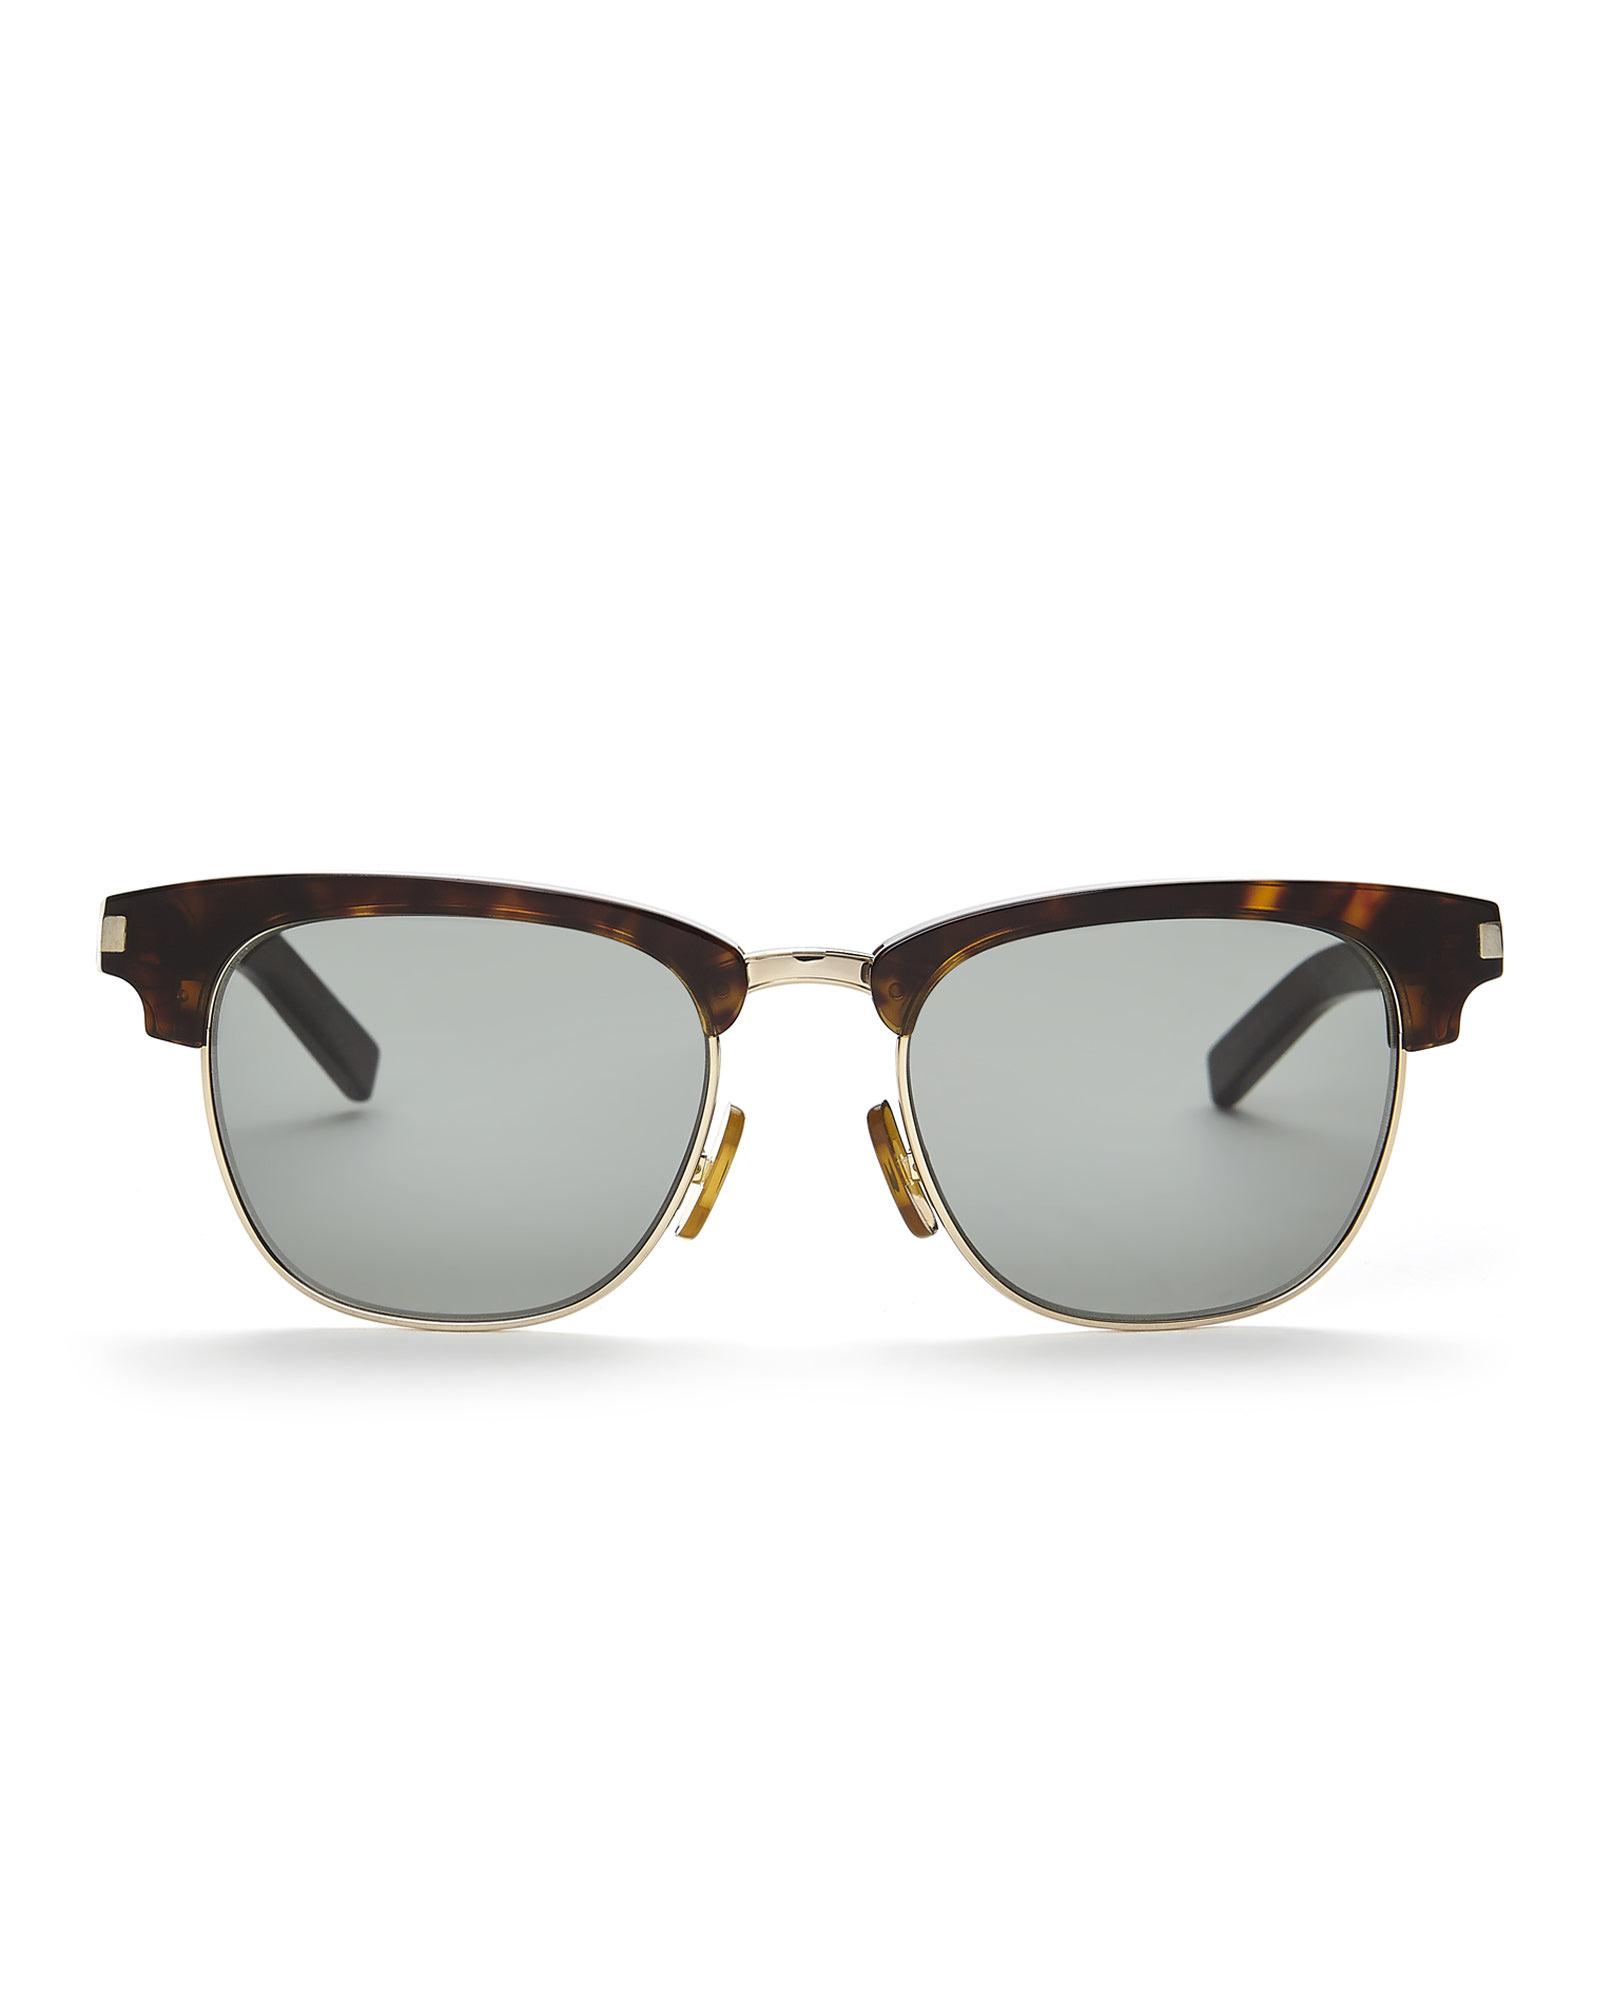 Half Rim Sunglasses  saint lau tortoises look gold tone sl 83 half rim